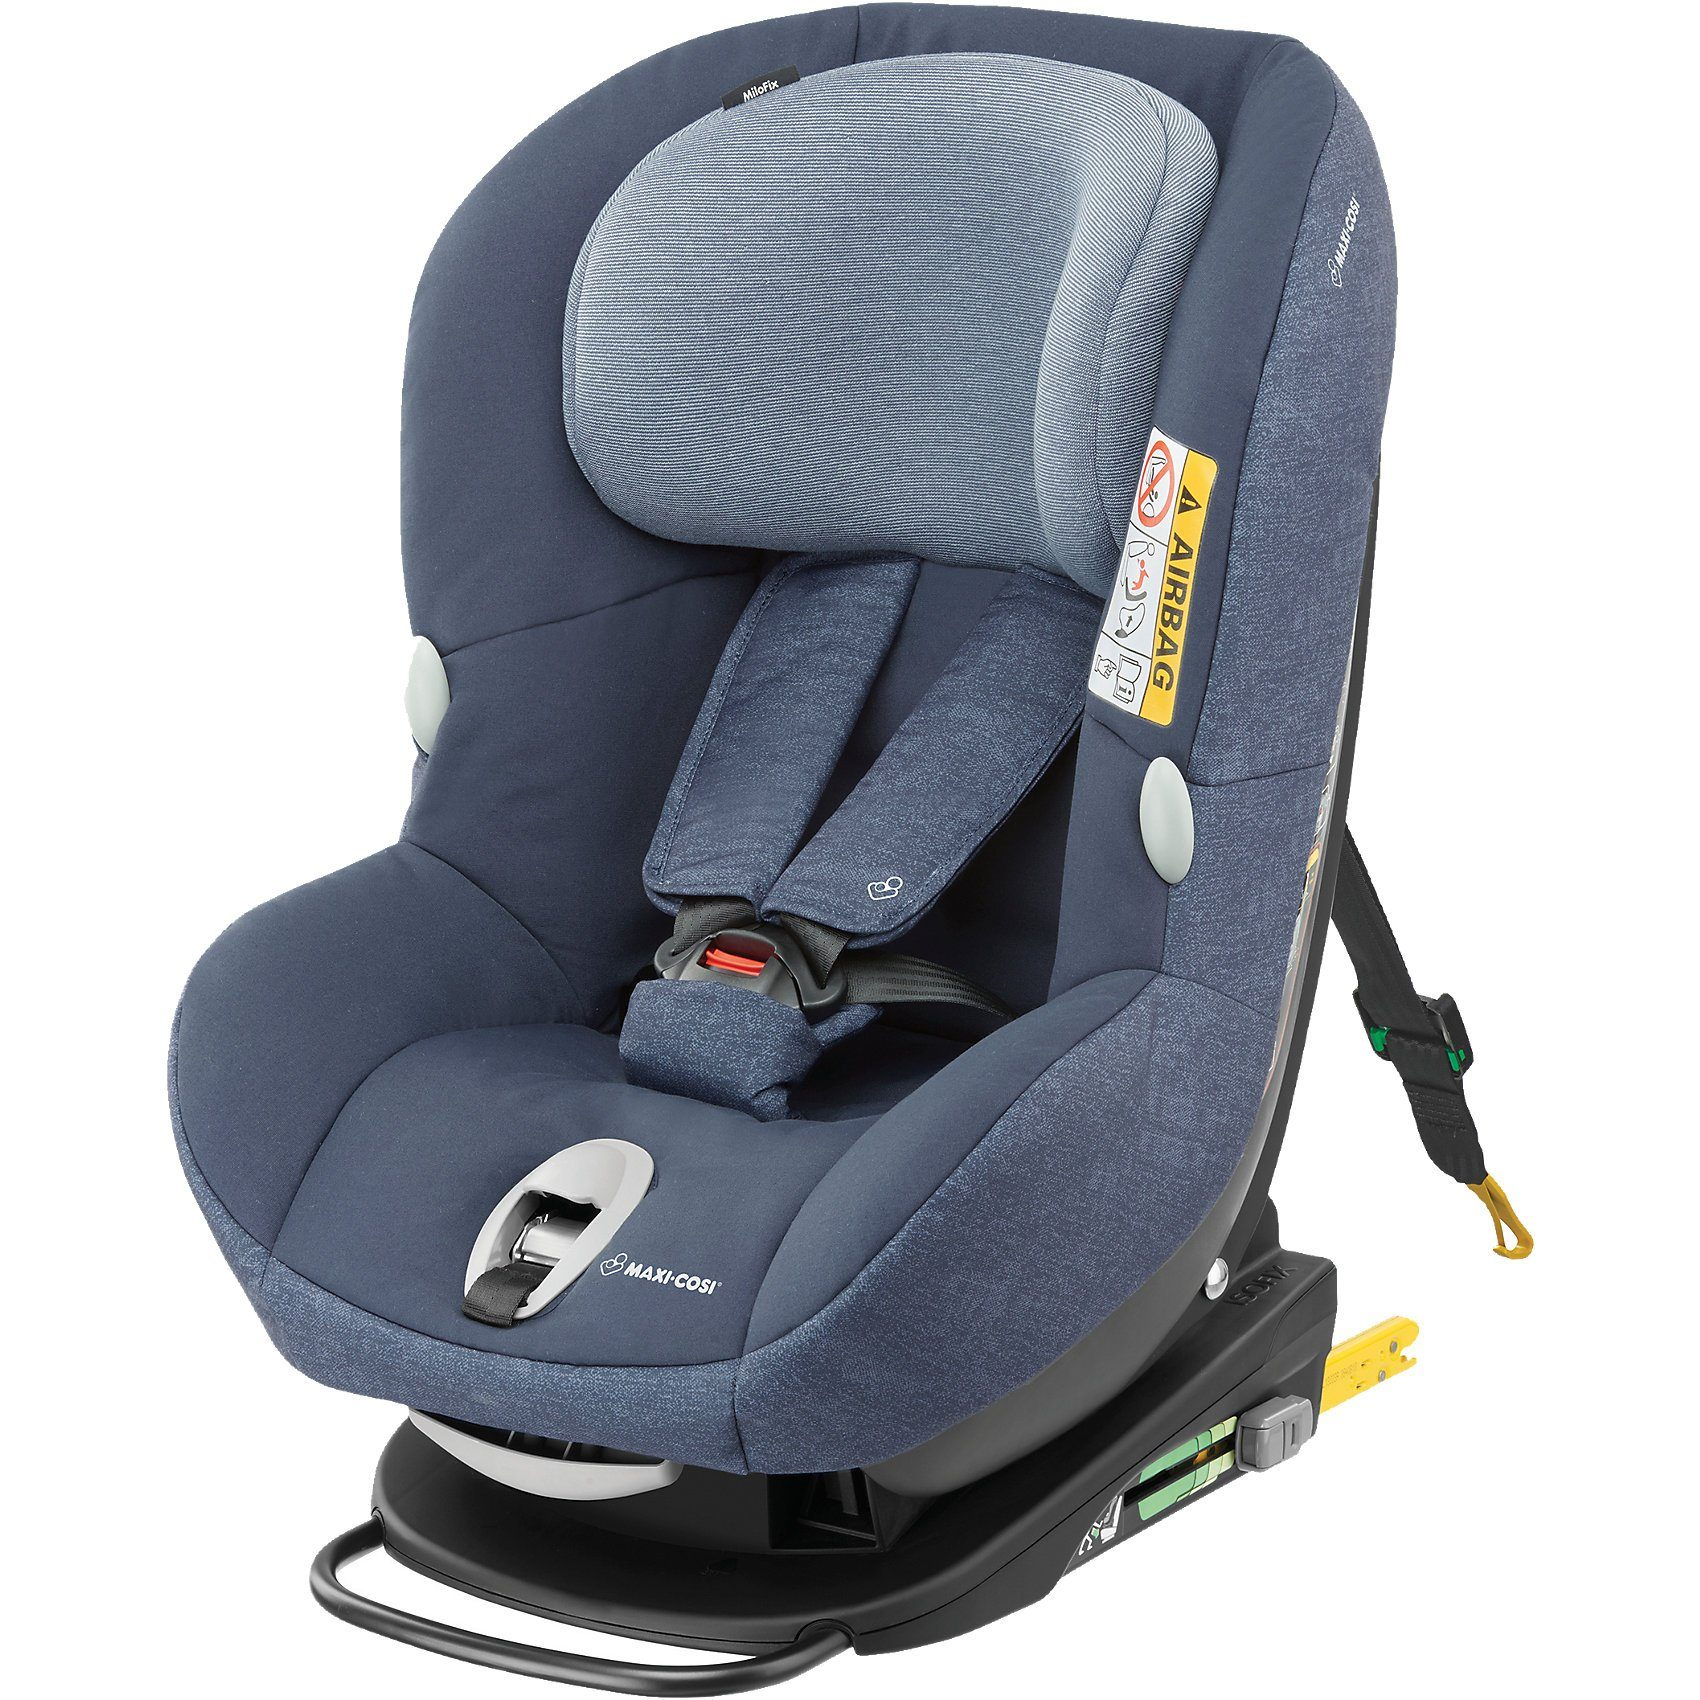 Maxi-Cosi Auto-Kindersitz MiloFix, Nomad Blue, 2018